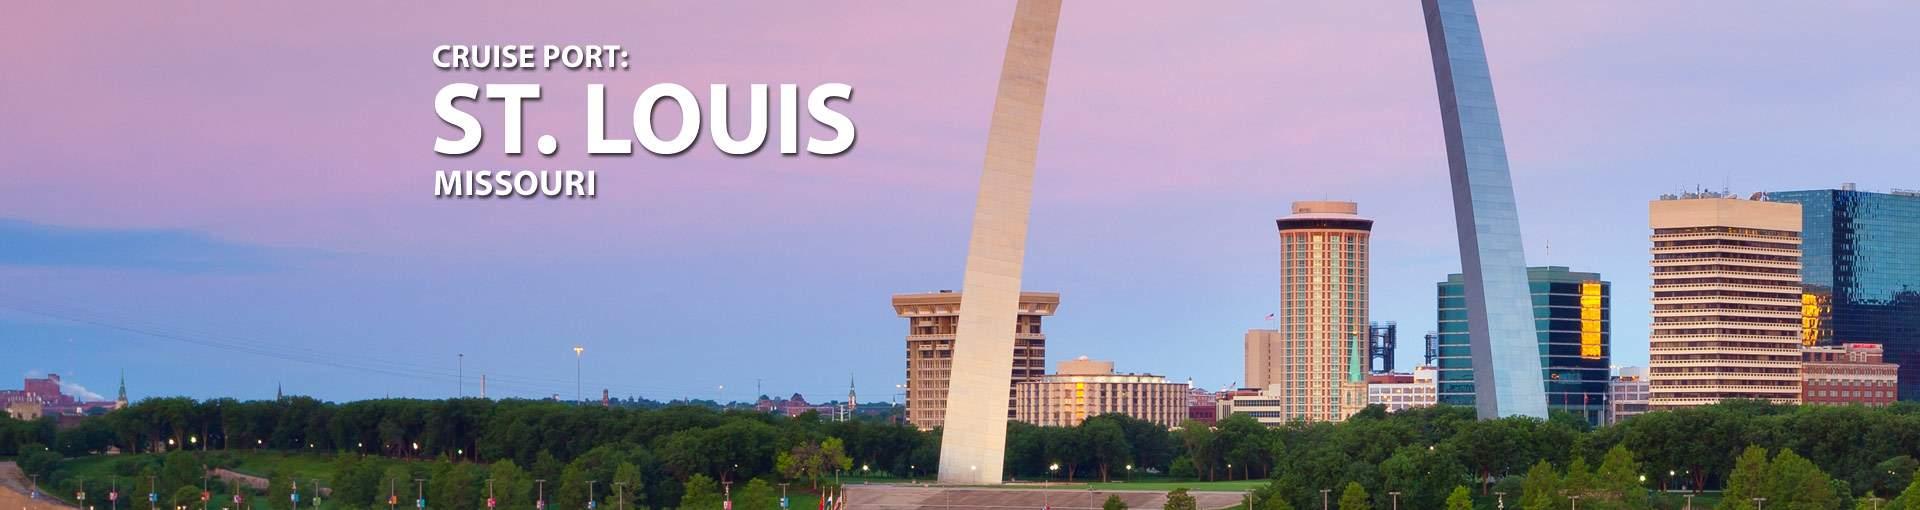 Cruise Port: St. Louis, Missouri